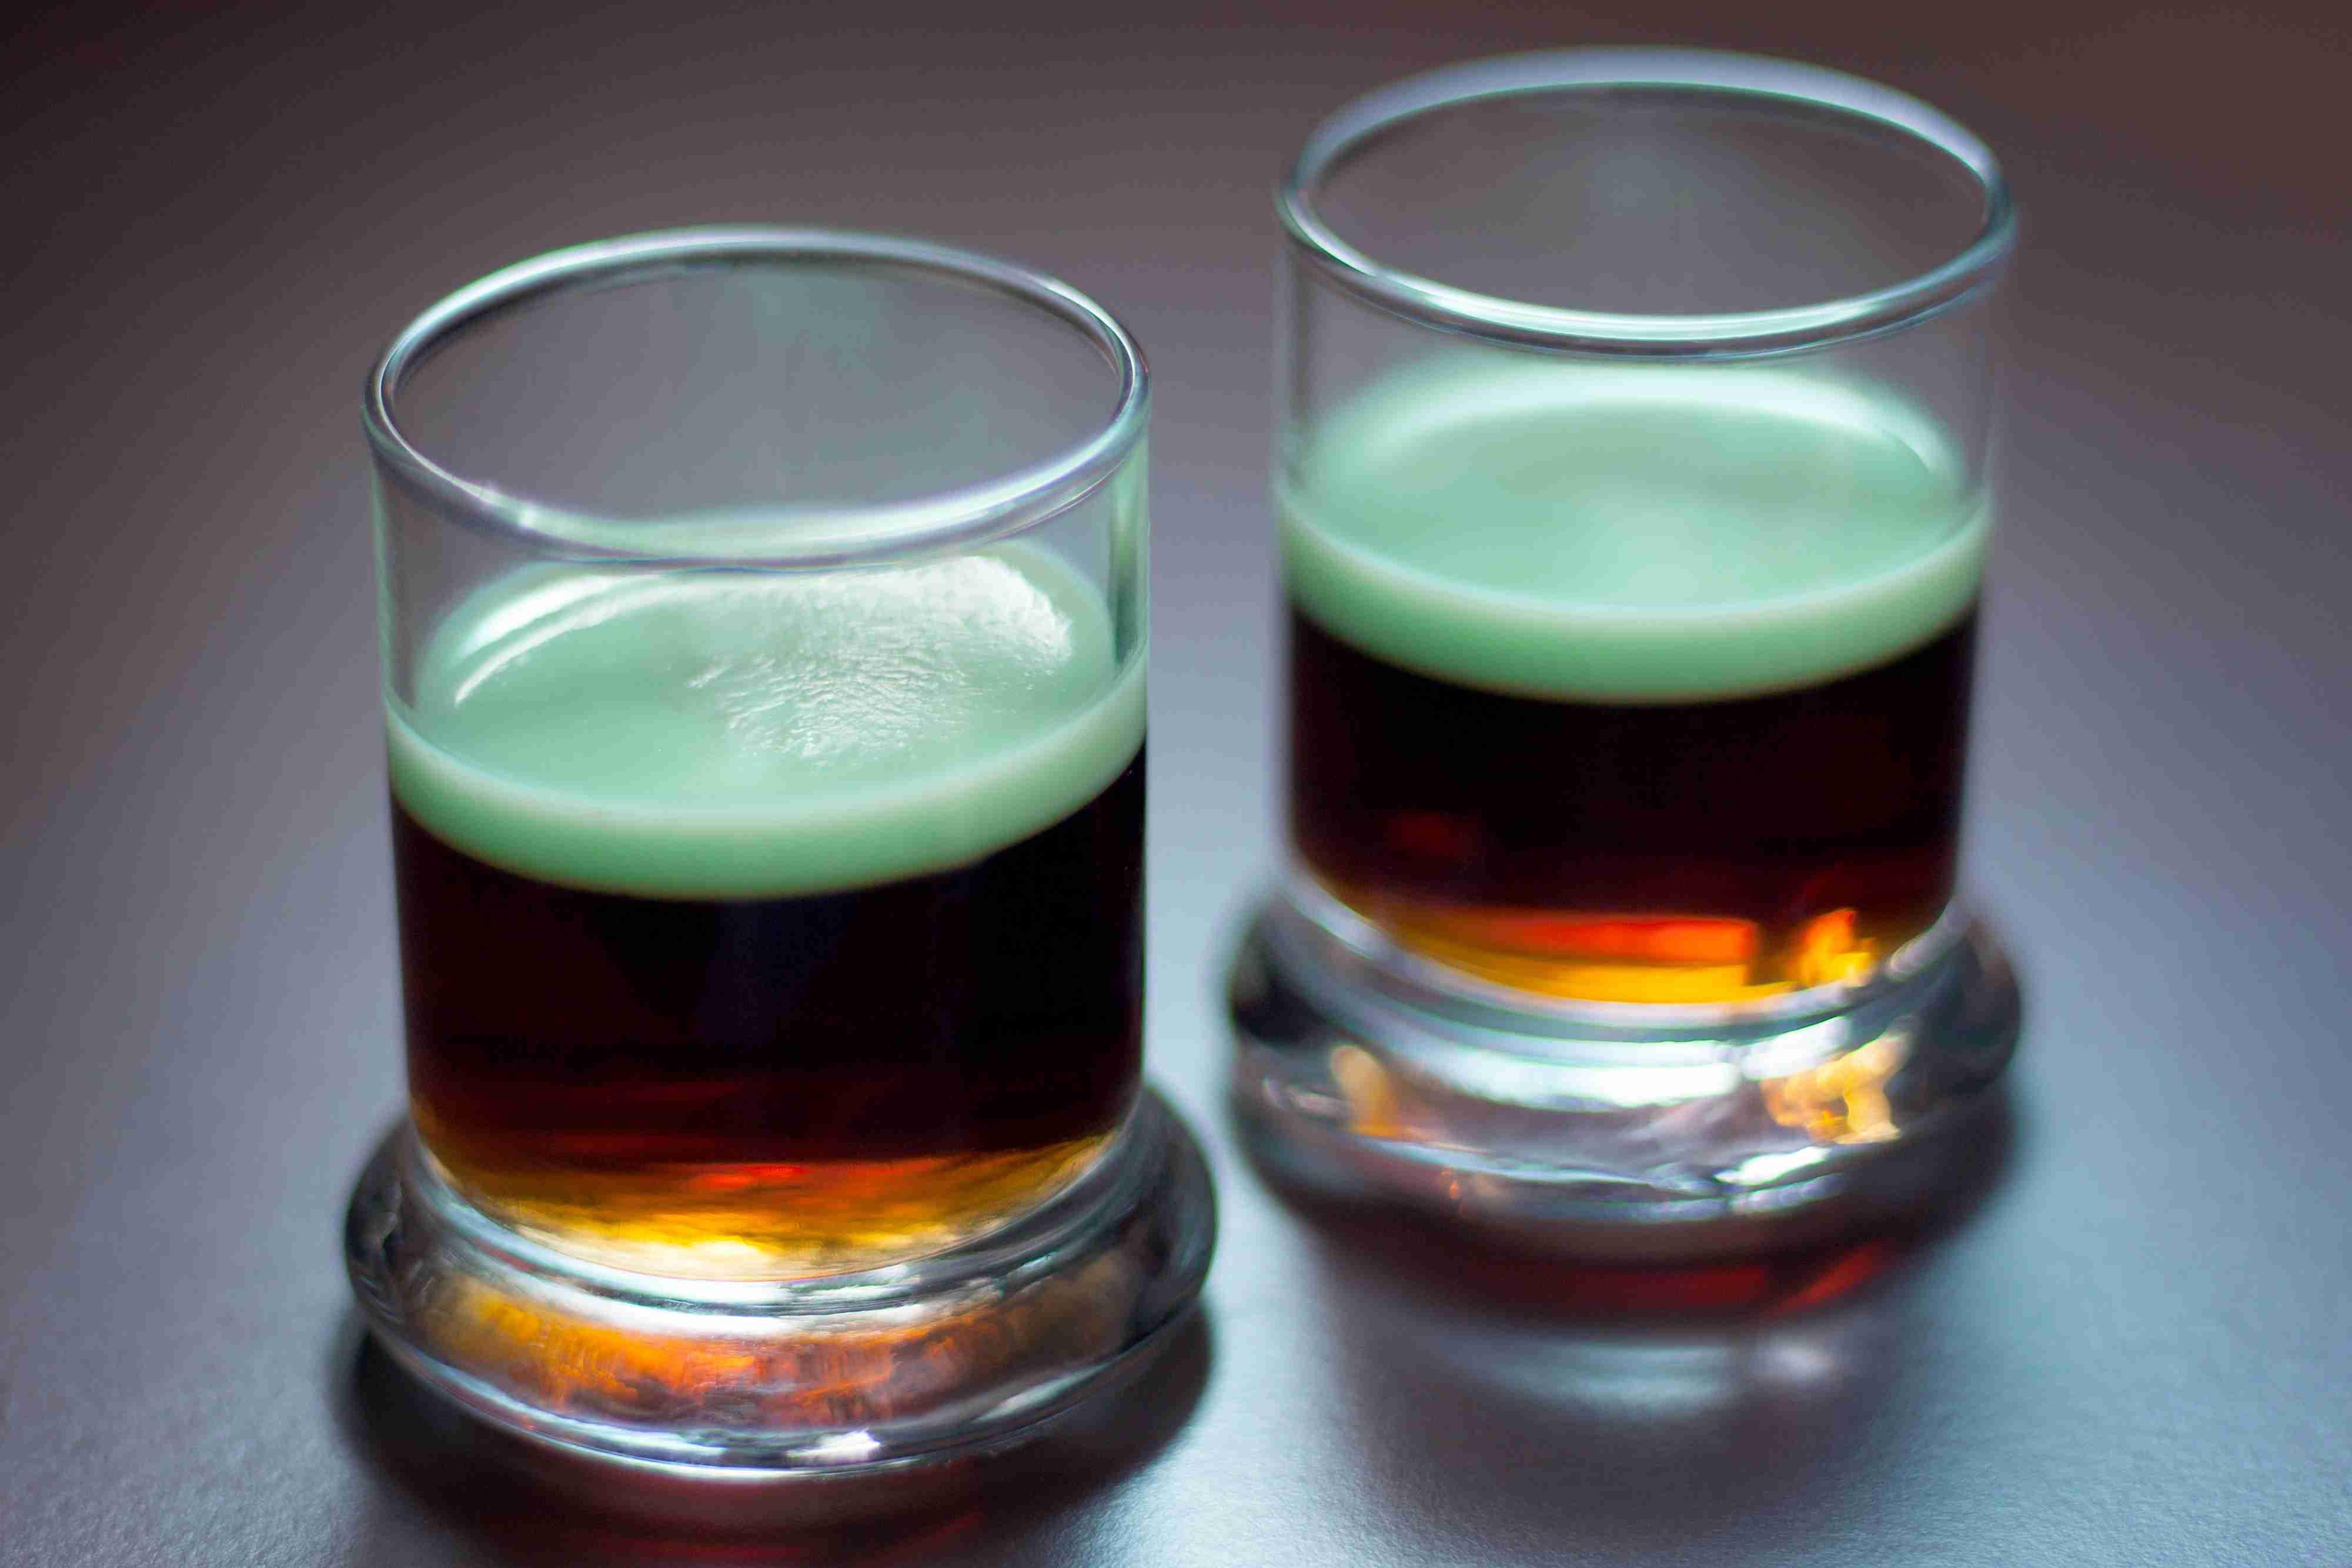 Guinness & Green Jell-O Shots